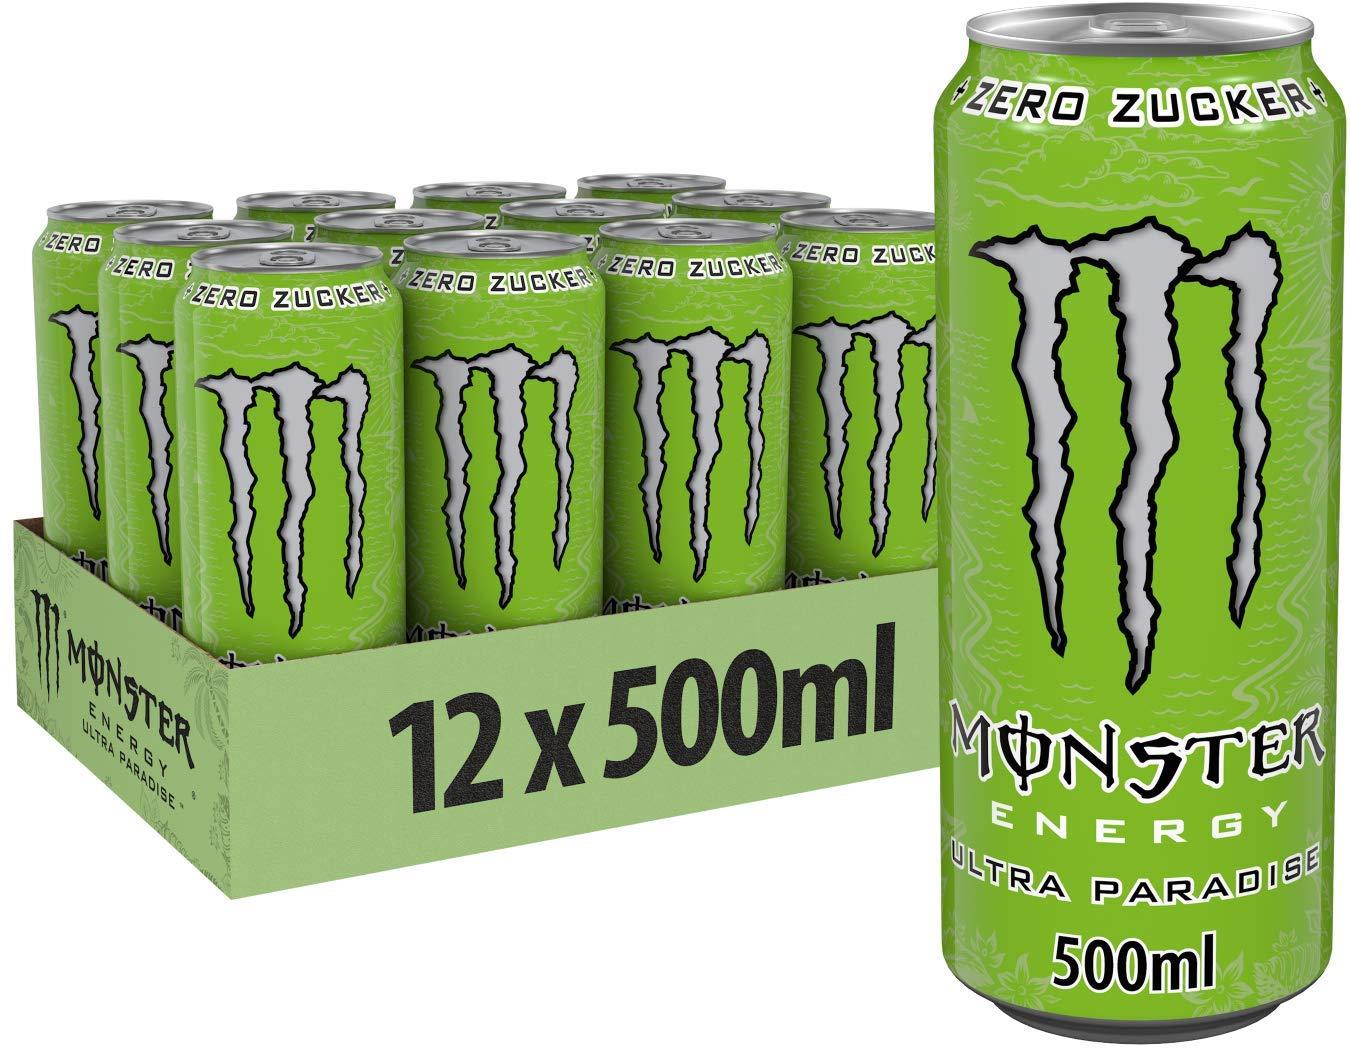 [Amazon prime personalisiert] Monster Energy Ultra Paradise -5 Euro geschenkt durch SPARABO-Trick! Beispiel ca. 50% effektiver Rabatt!